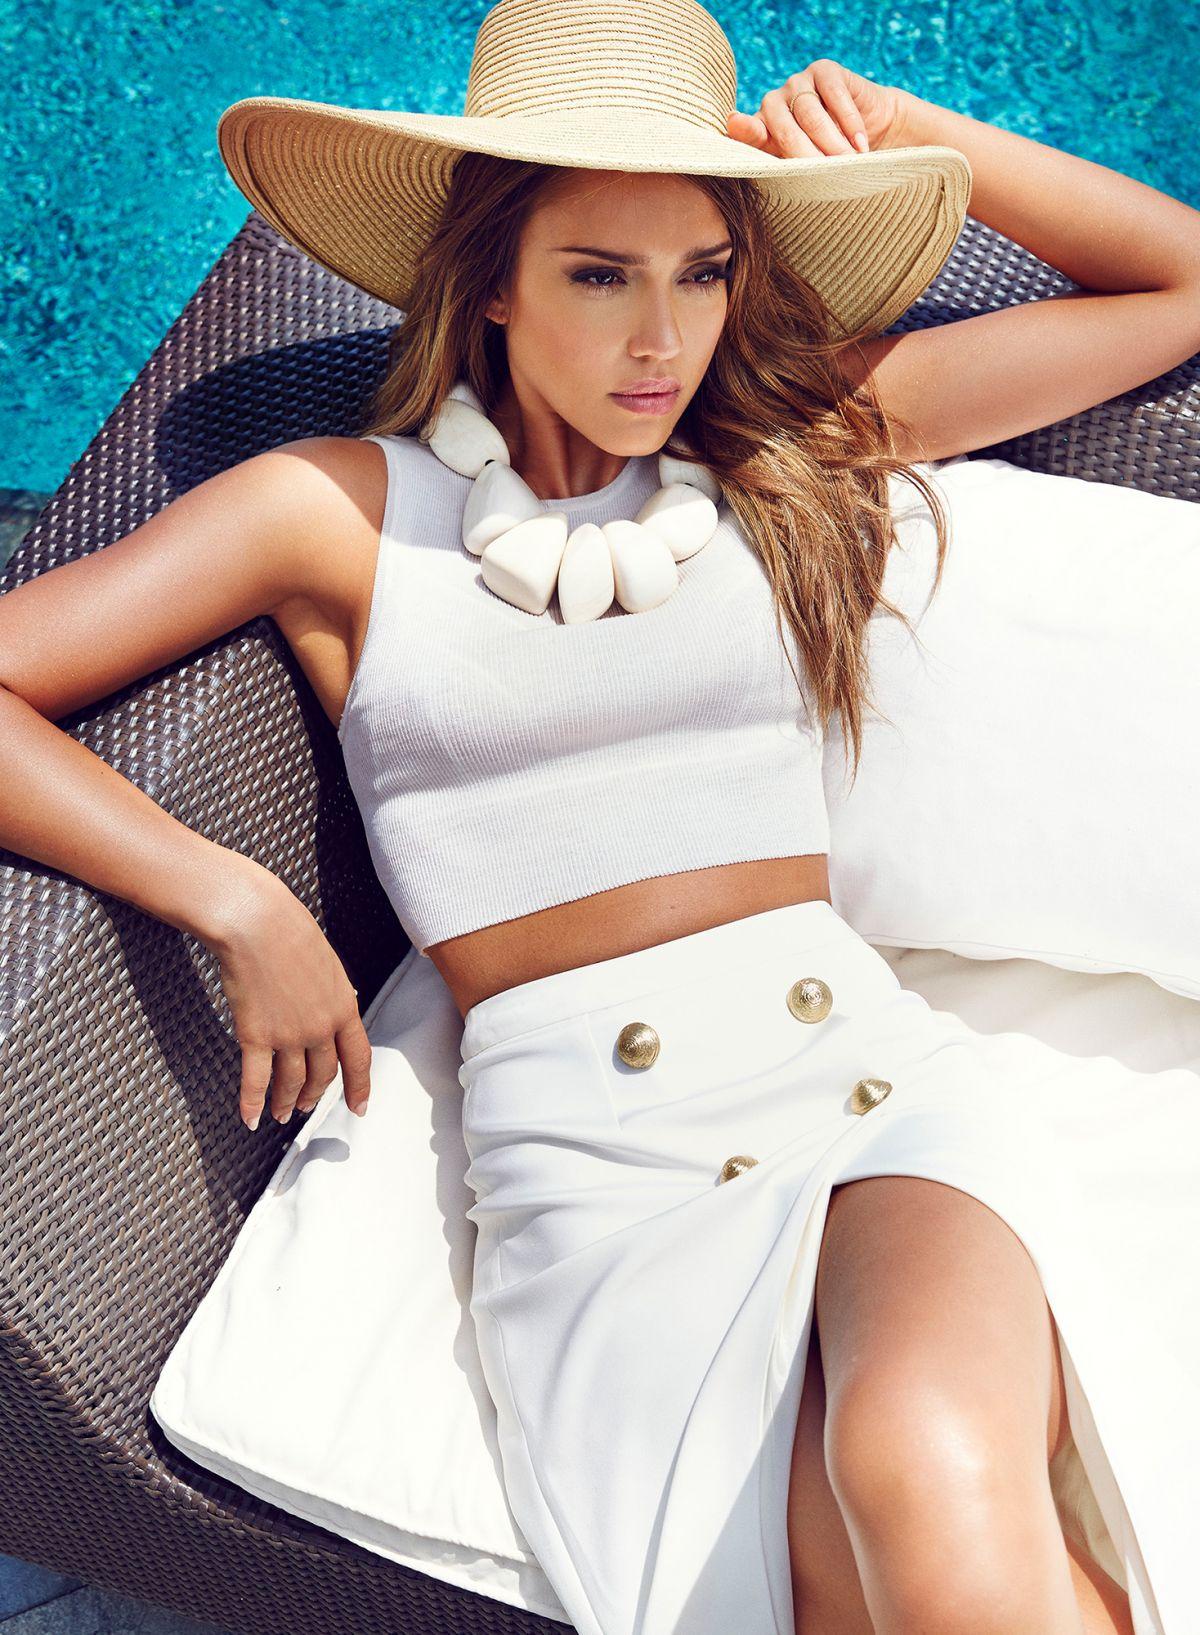 JESSICA ALBA in Cosmopolitan Magazine, Turkey August 2014